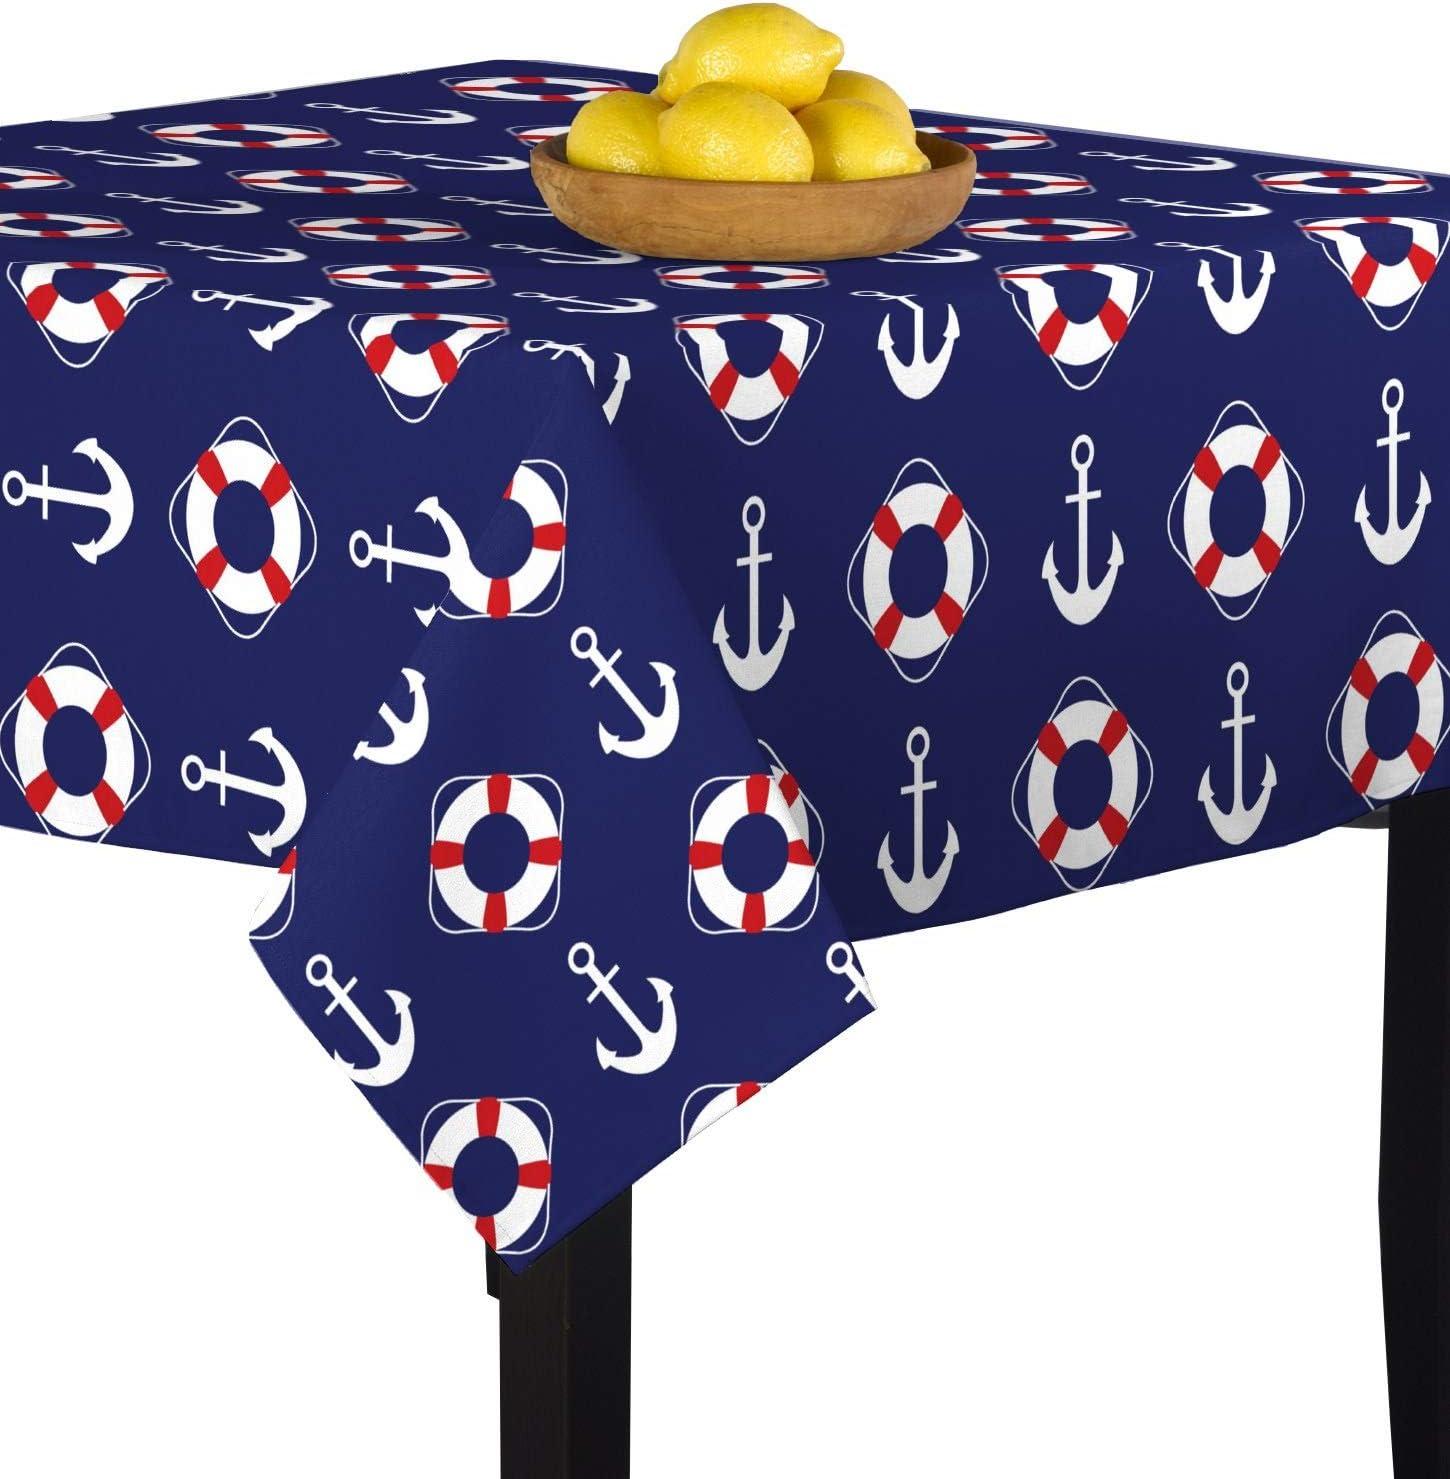 Fabric Textile Products Anchors Tablecloth Savers Regular dealer Life 84